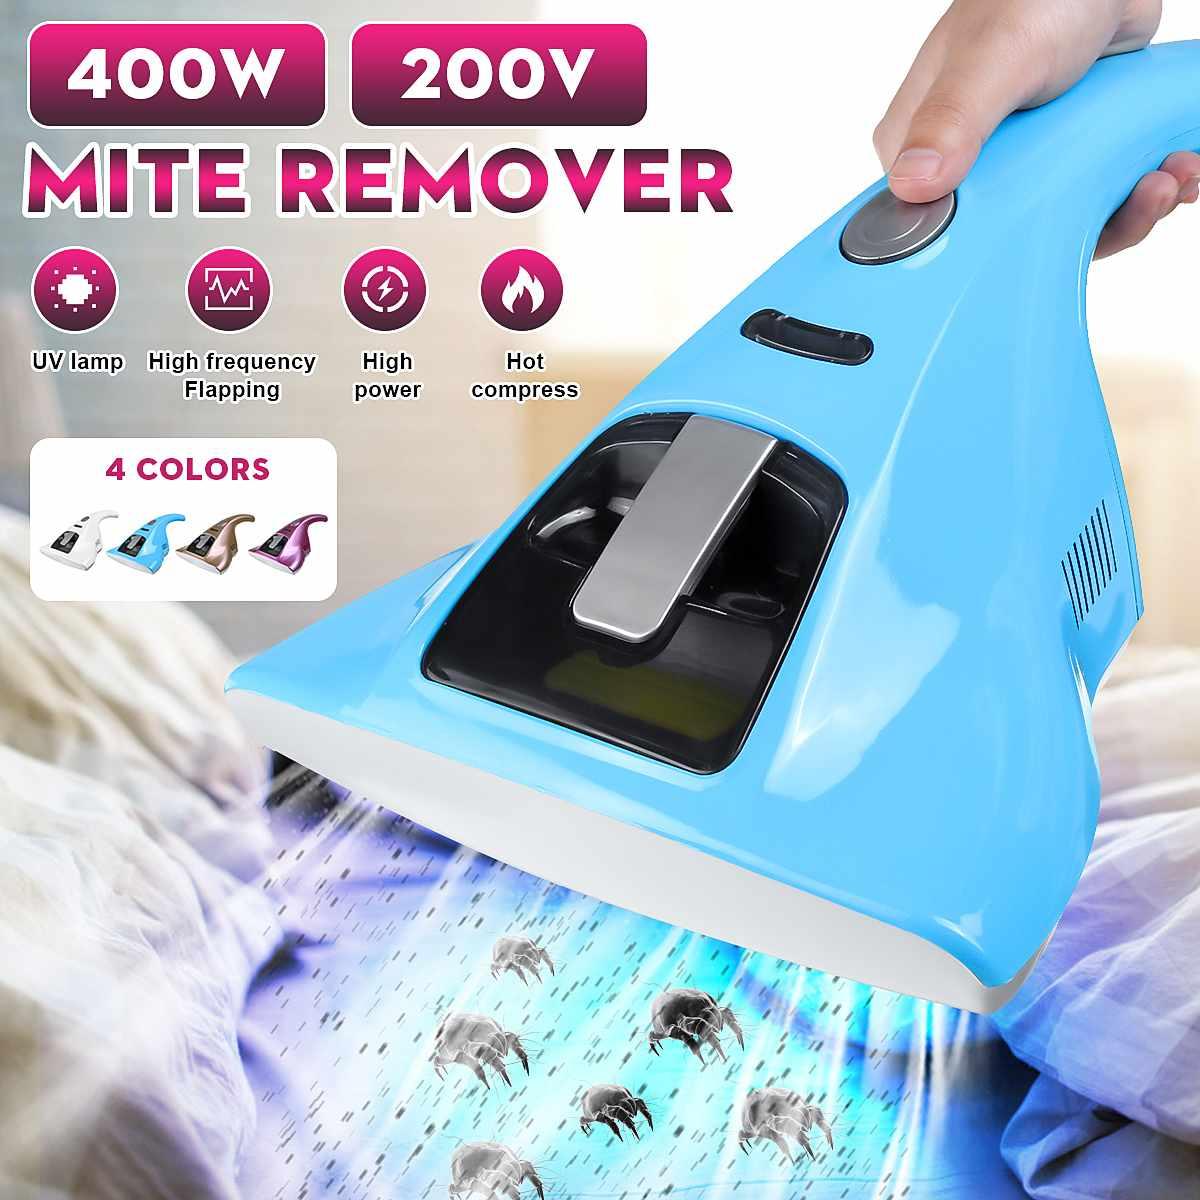 400 w portatil anti poeira acaros uv aspirador de po domestico anti bacteriano handheld uv esterilizar